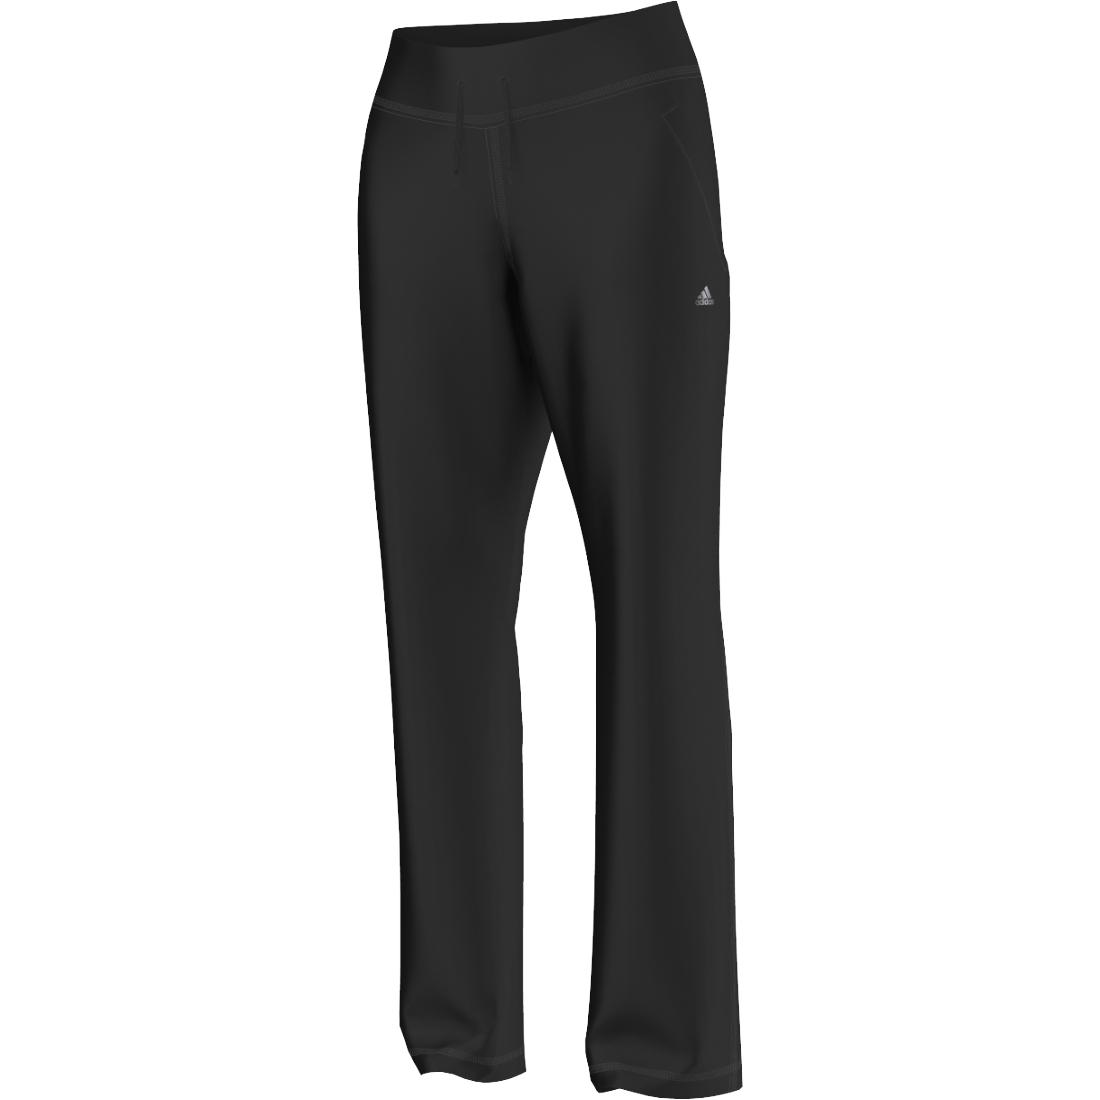 Image of   Adidas Gym Basics Woven Pant